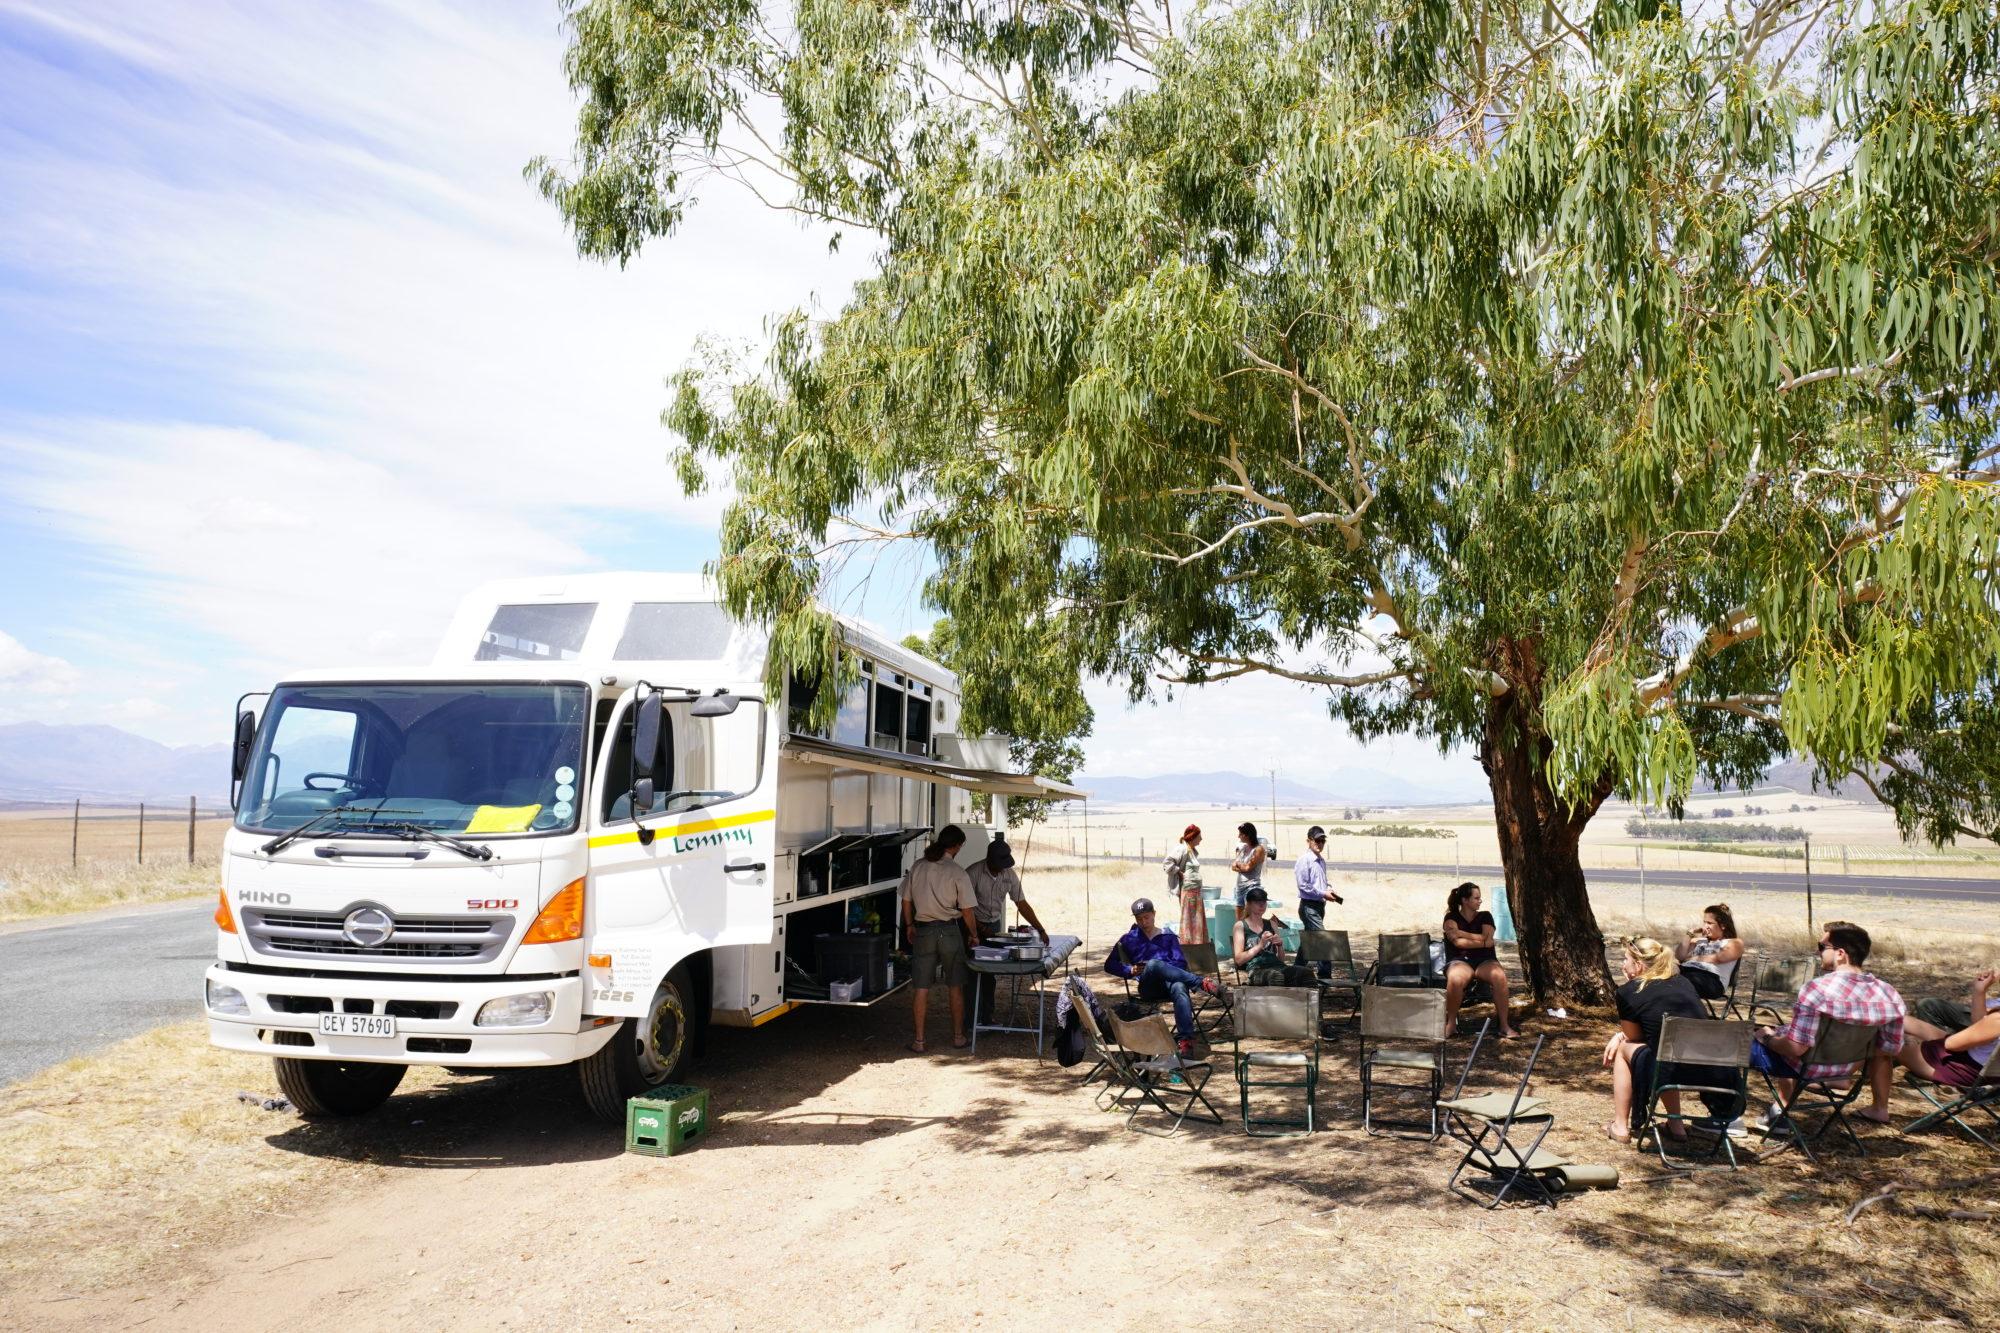 Africa overland tours 2018 | MITS MATSUNAGA